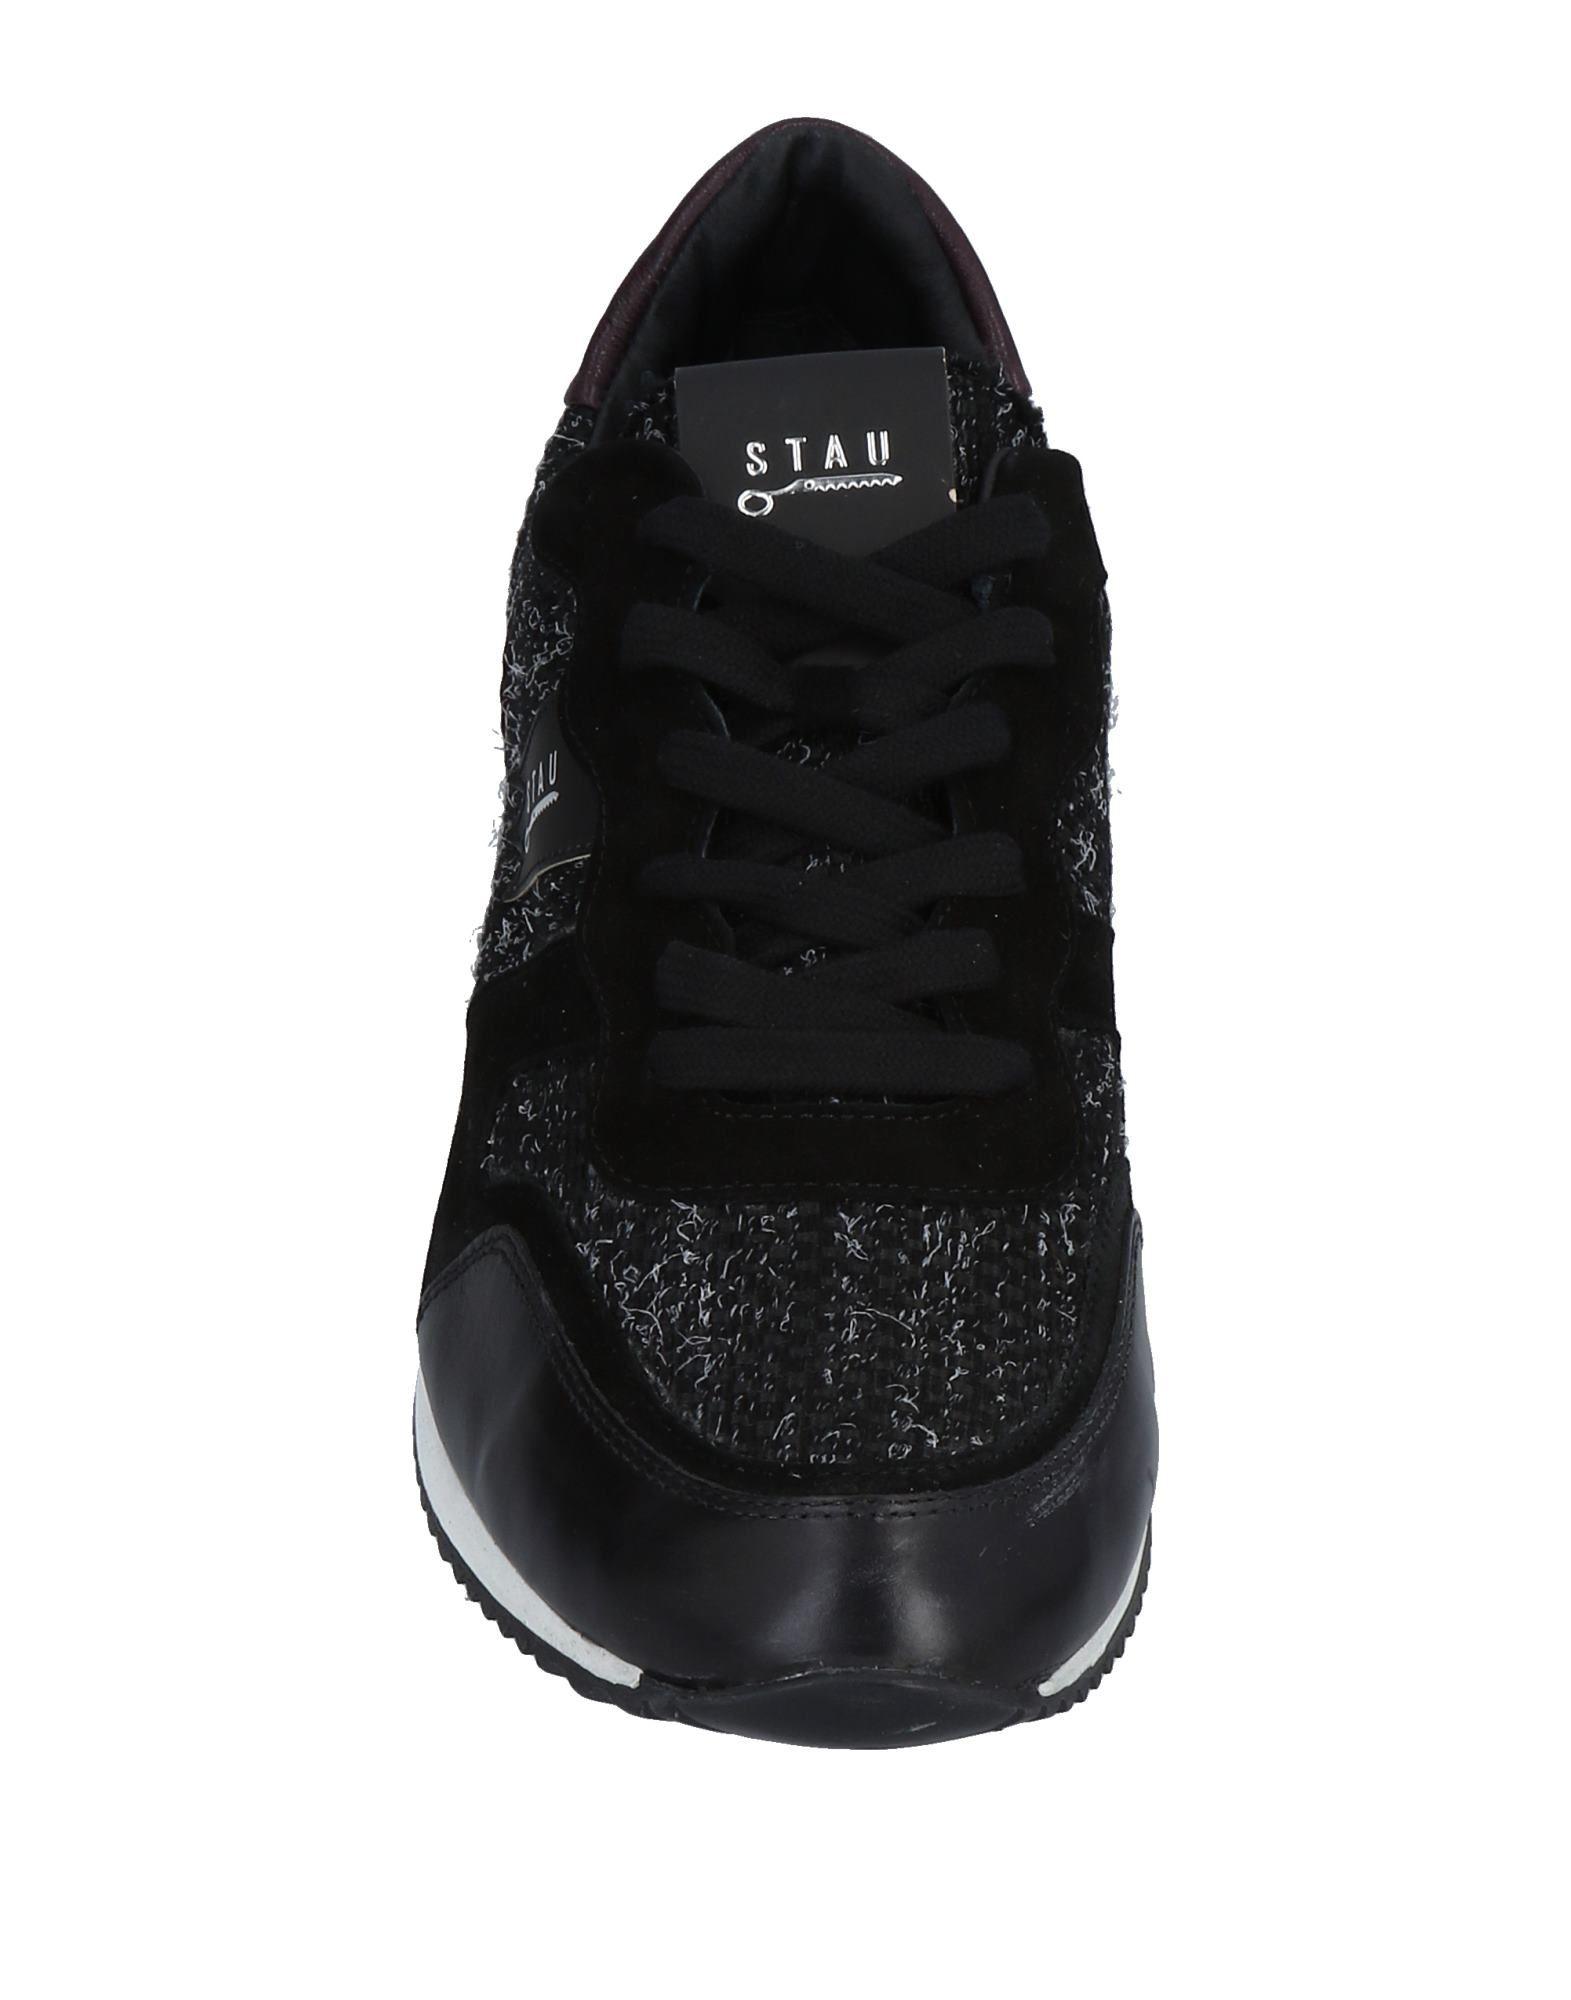 Stau Stau Stau Sneakers - Men Stau Sneakers online on  Australia - 11484675SL cb6c73